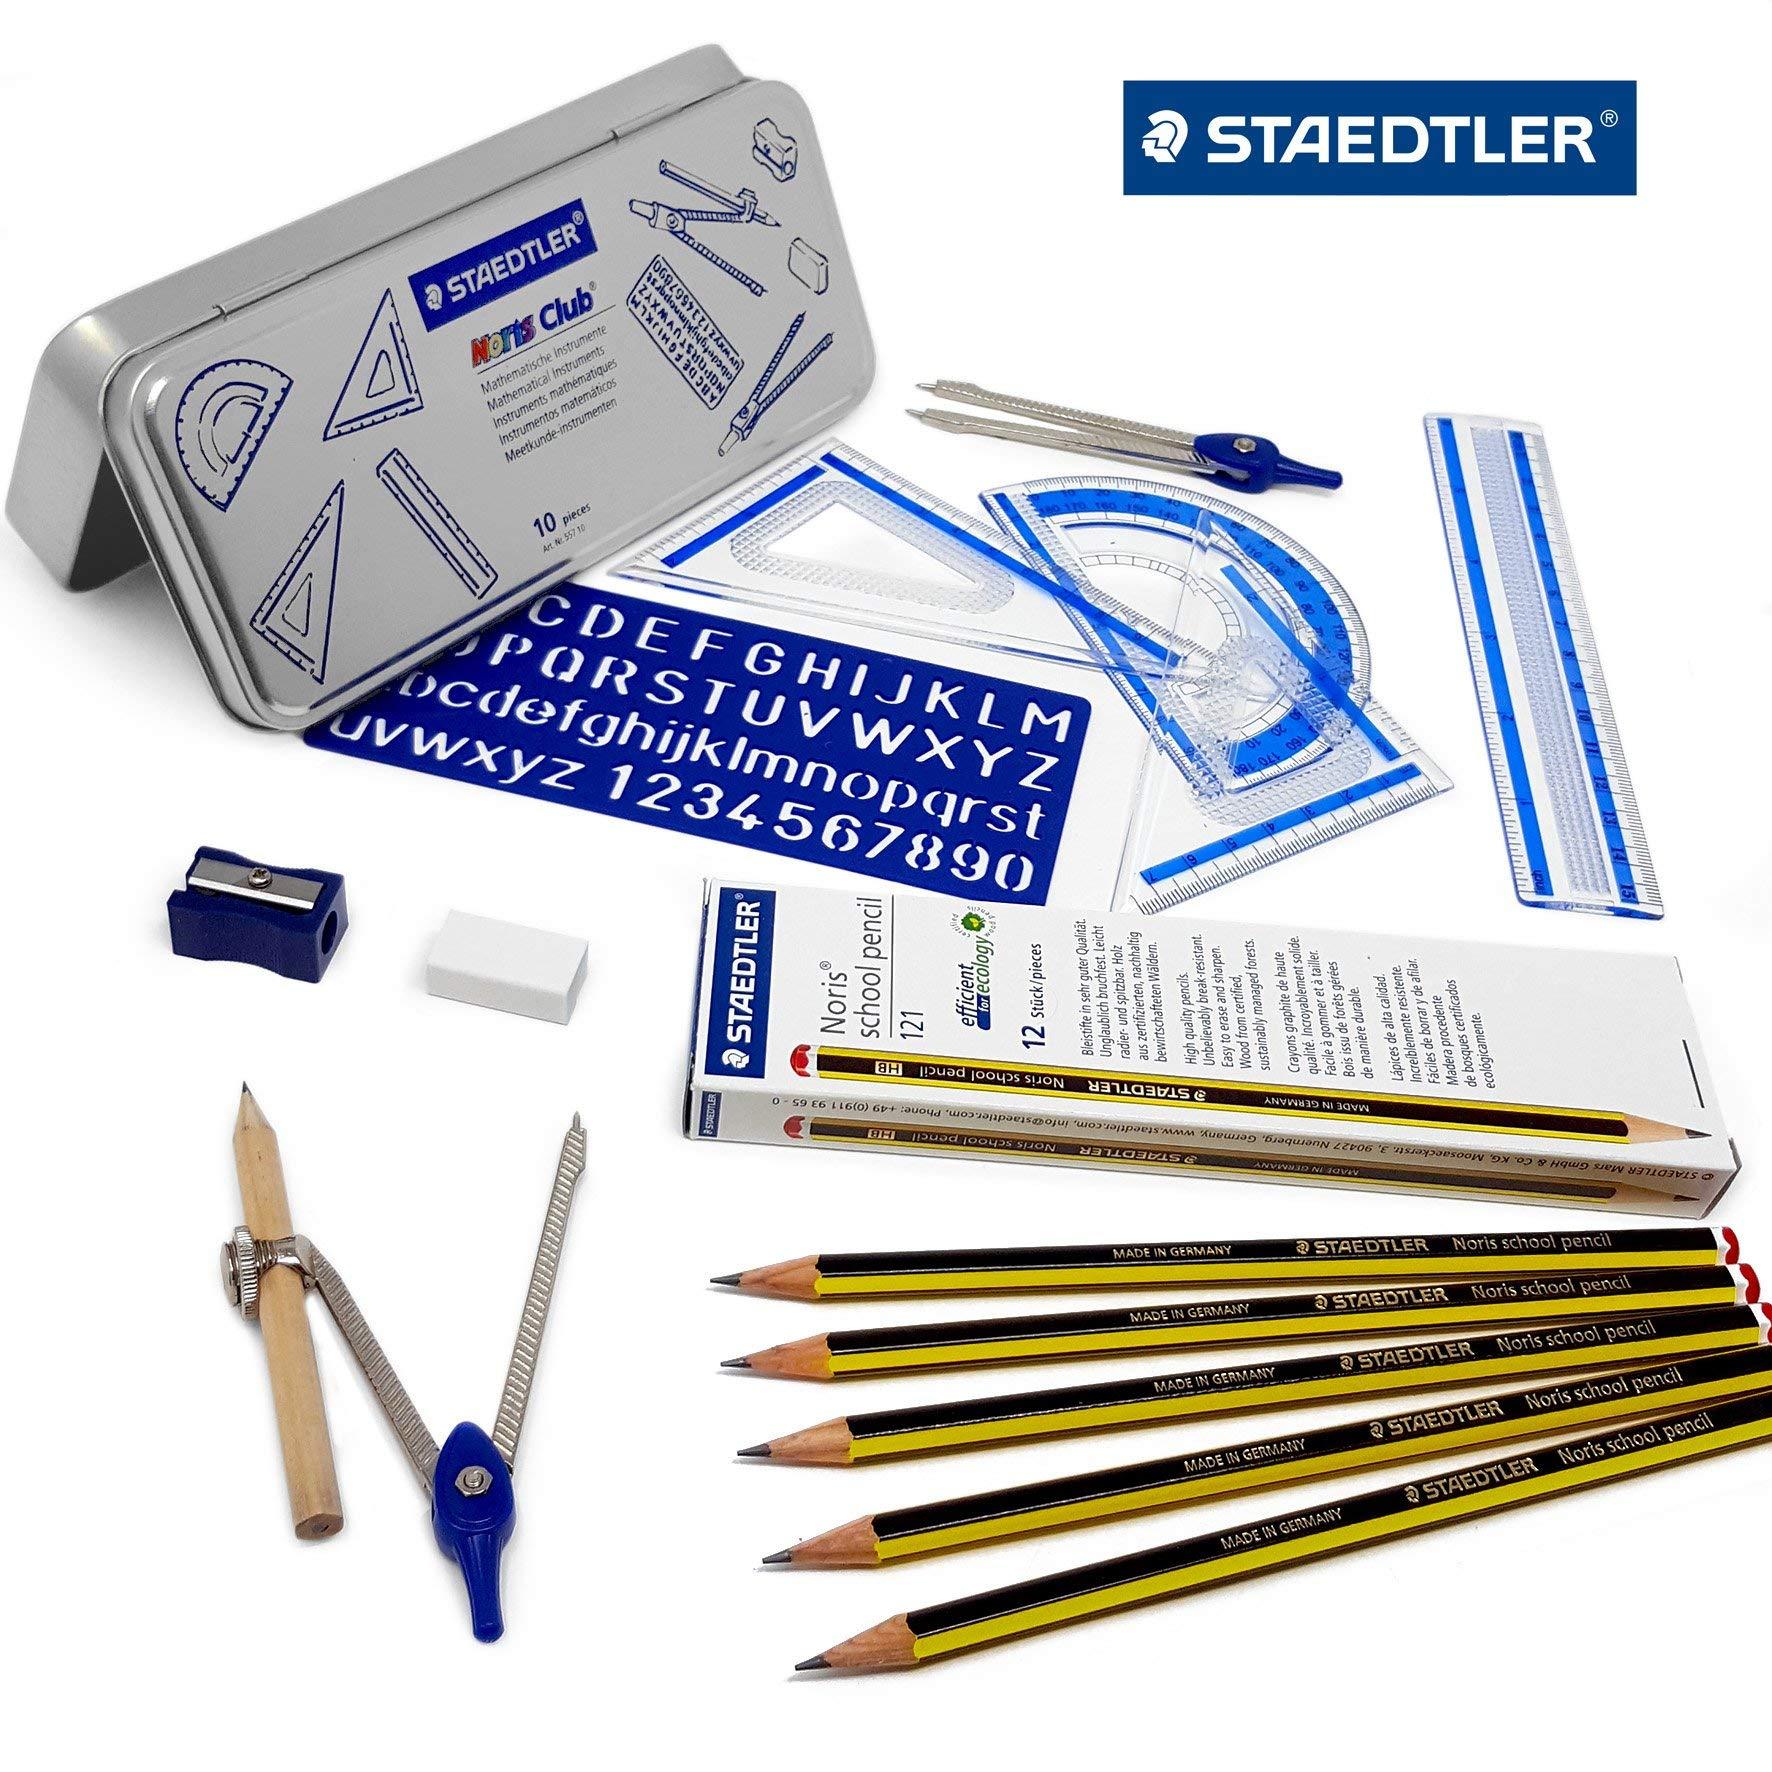 Staedtler Back to School Set - 10 Piece Maths Set in Metal Gift Tin + 12 Noris Pencils - 2B by Staedtler